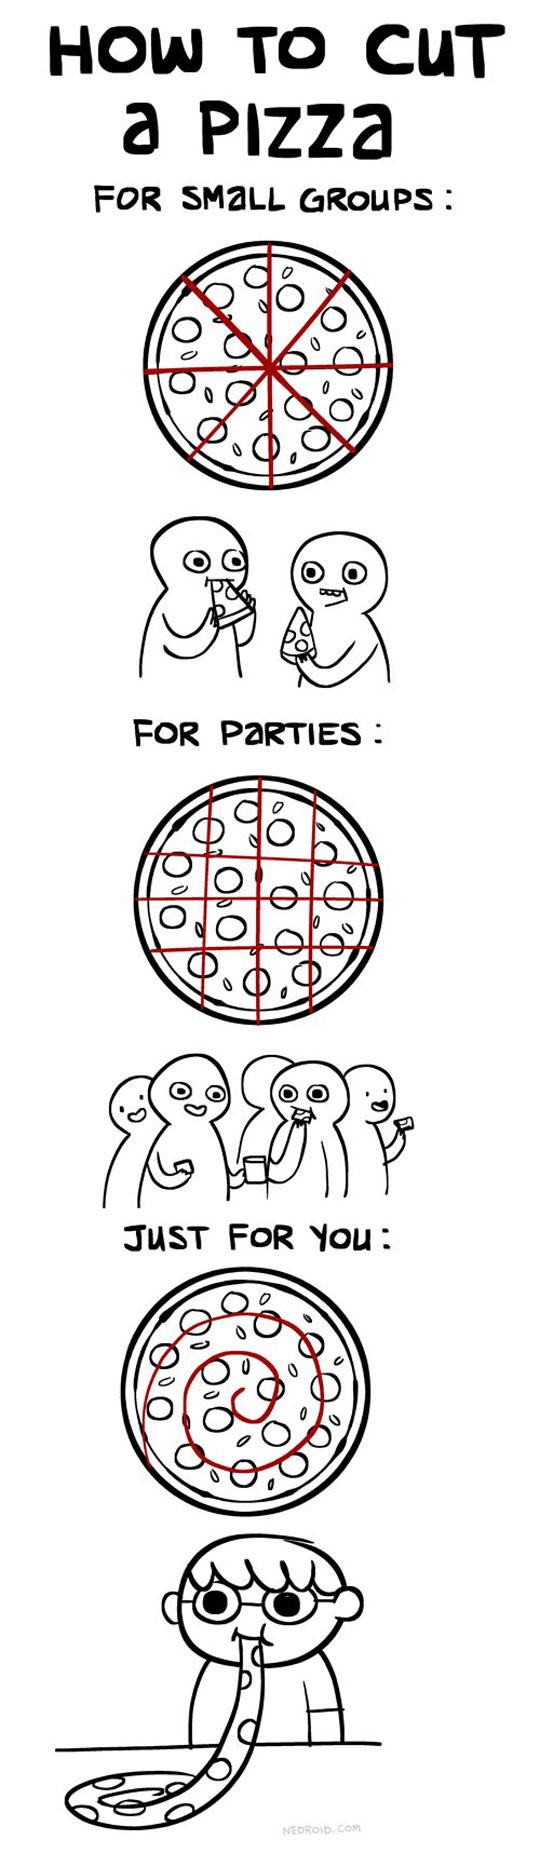 funny-cartoon-pizza-how-to-cut